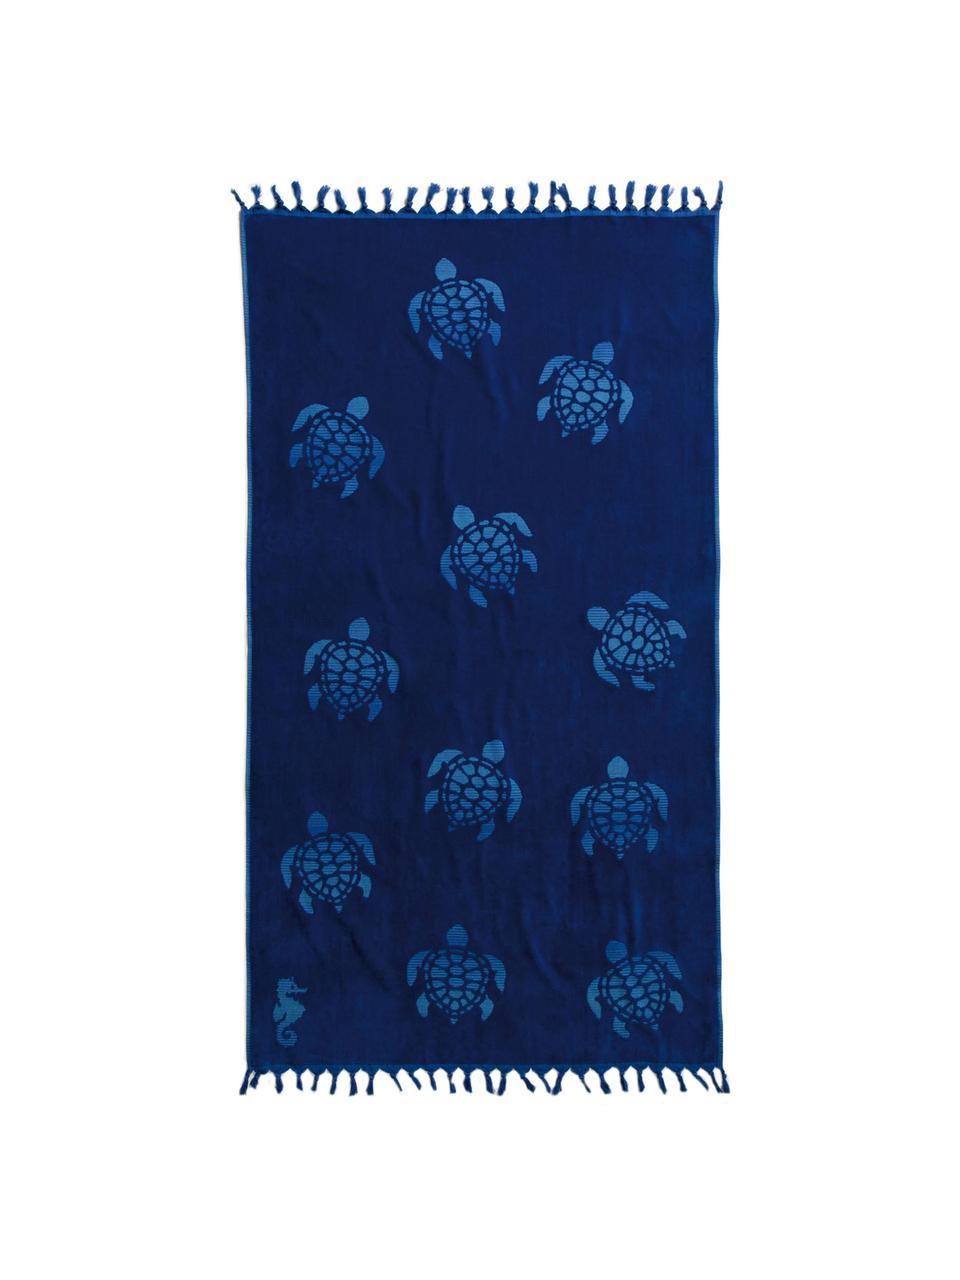 Hamamdoek Tartaruga, Katoen, Donkerblauw, 100 x 180 cm